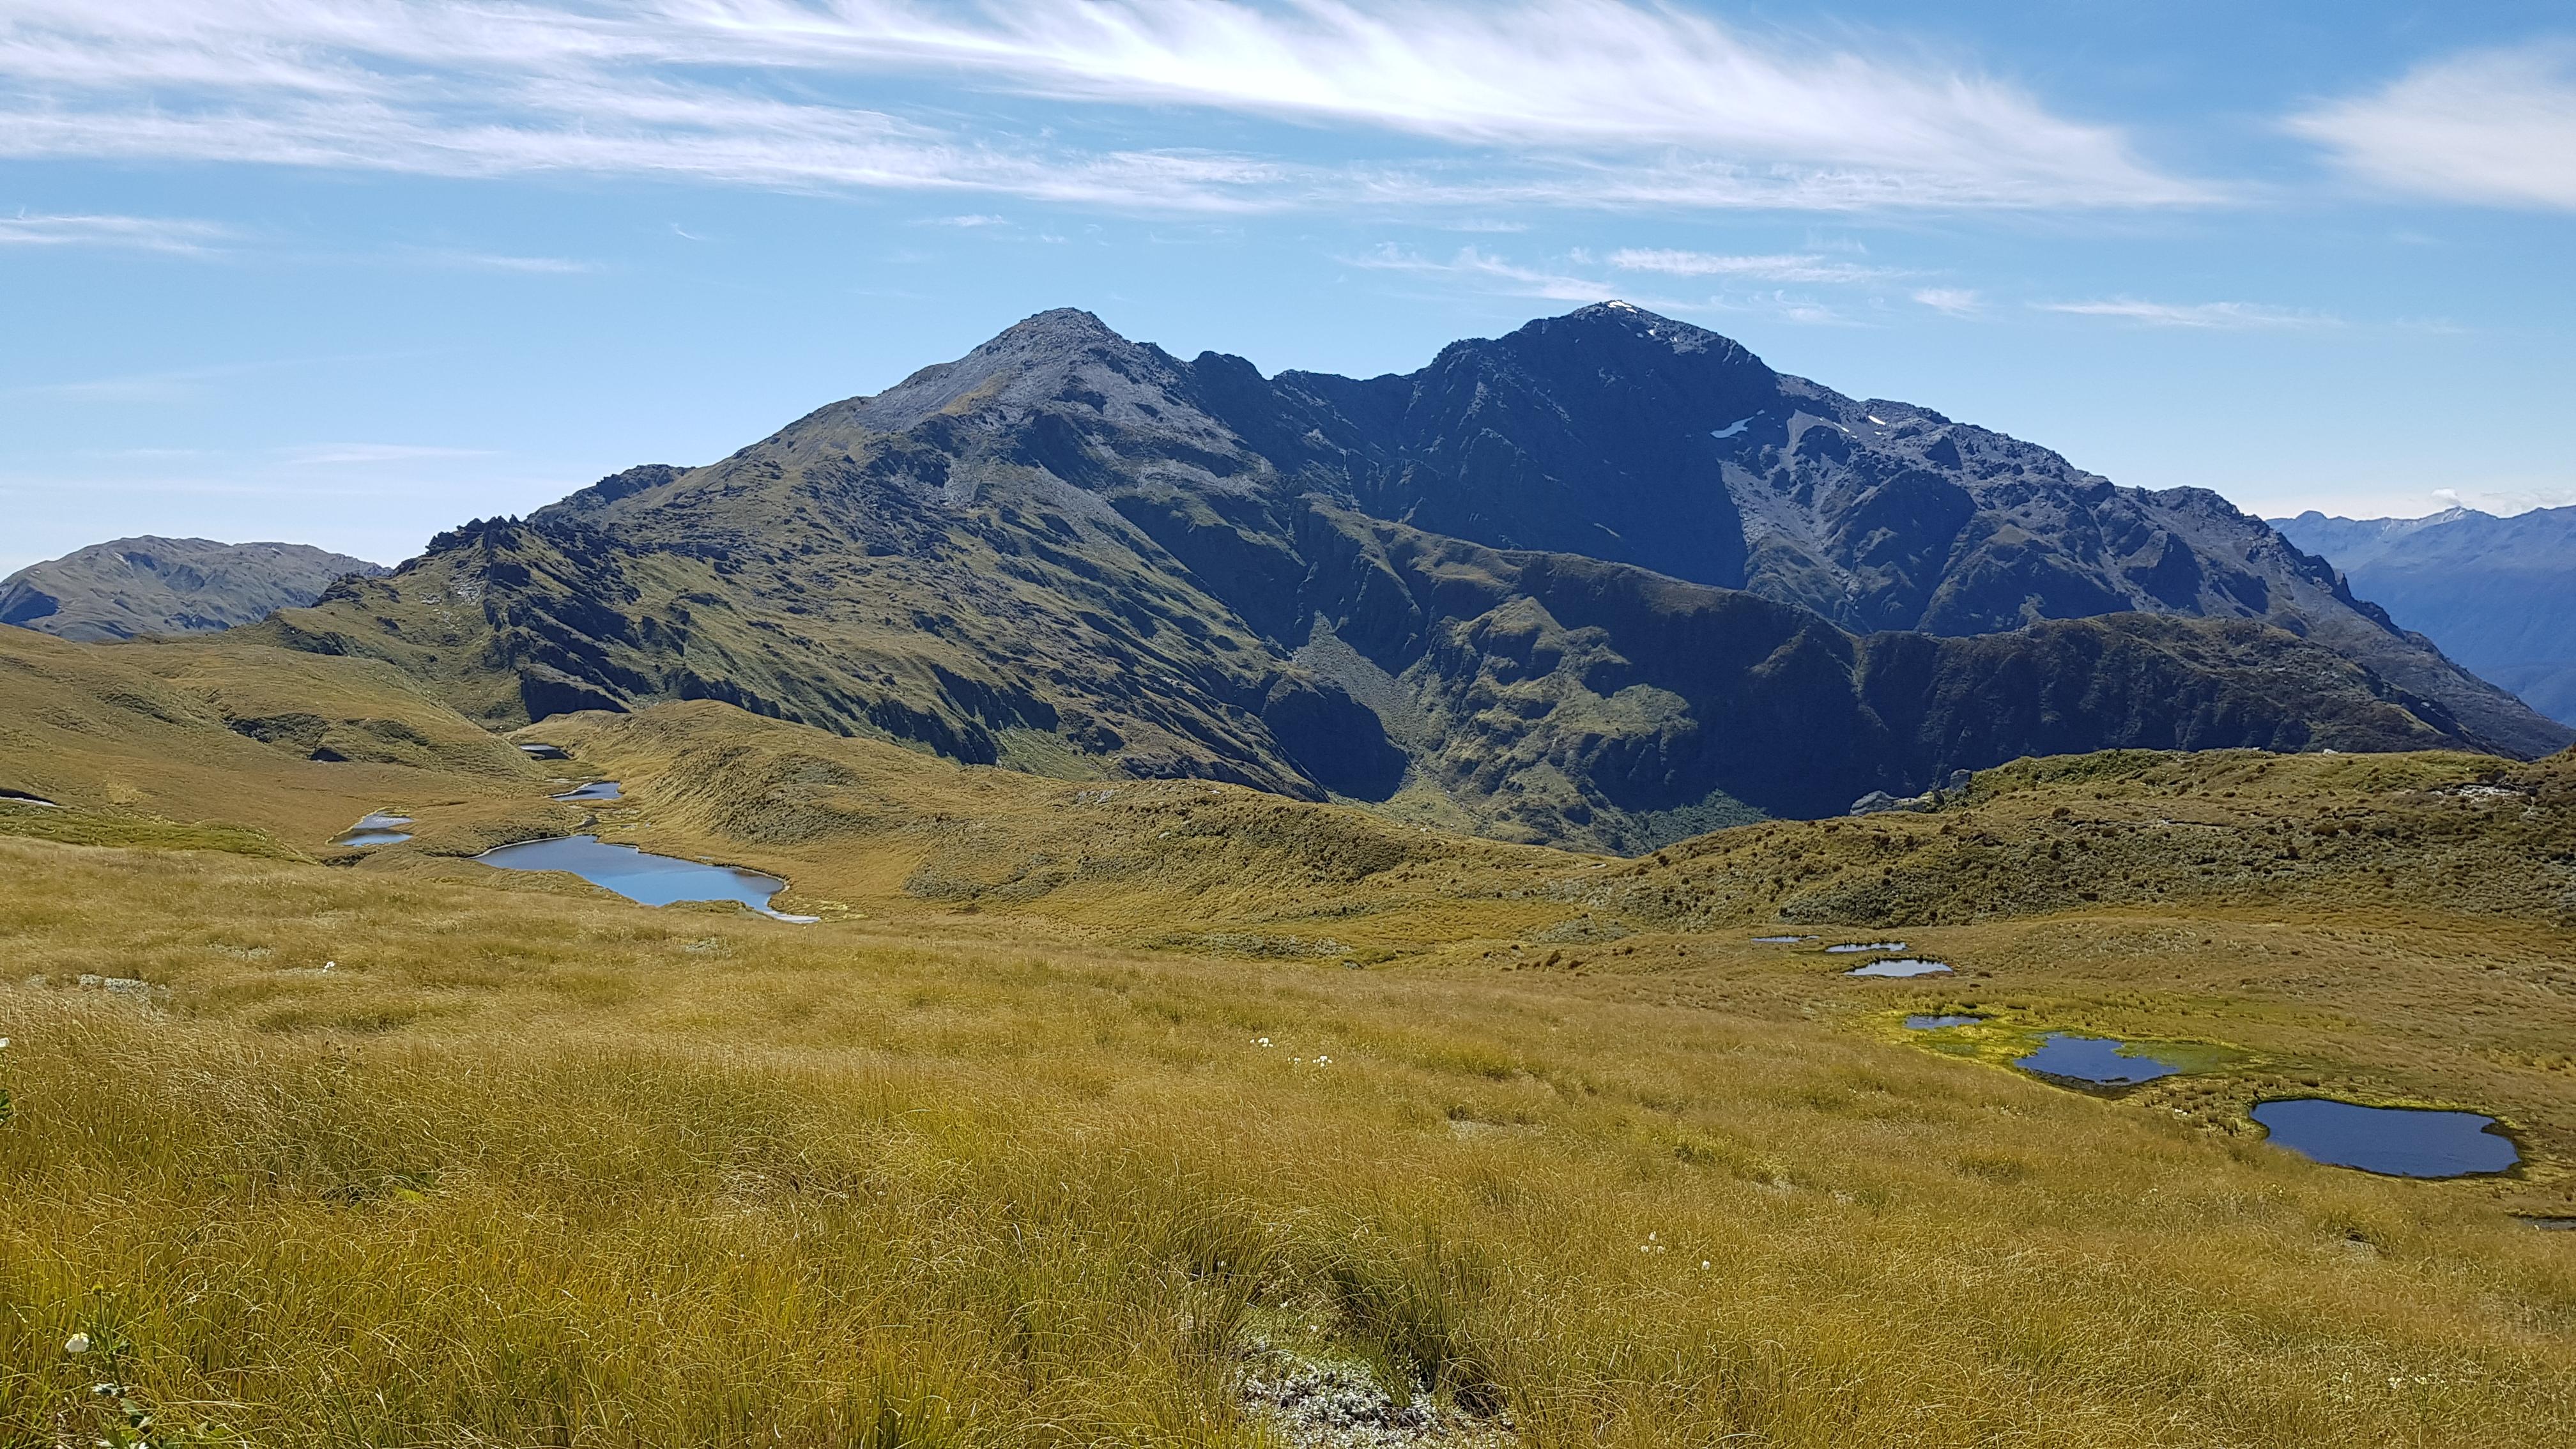 From the Kaimata range tops towards Mt Alexander